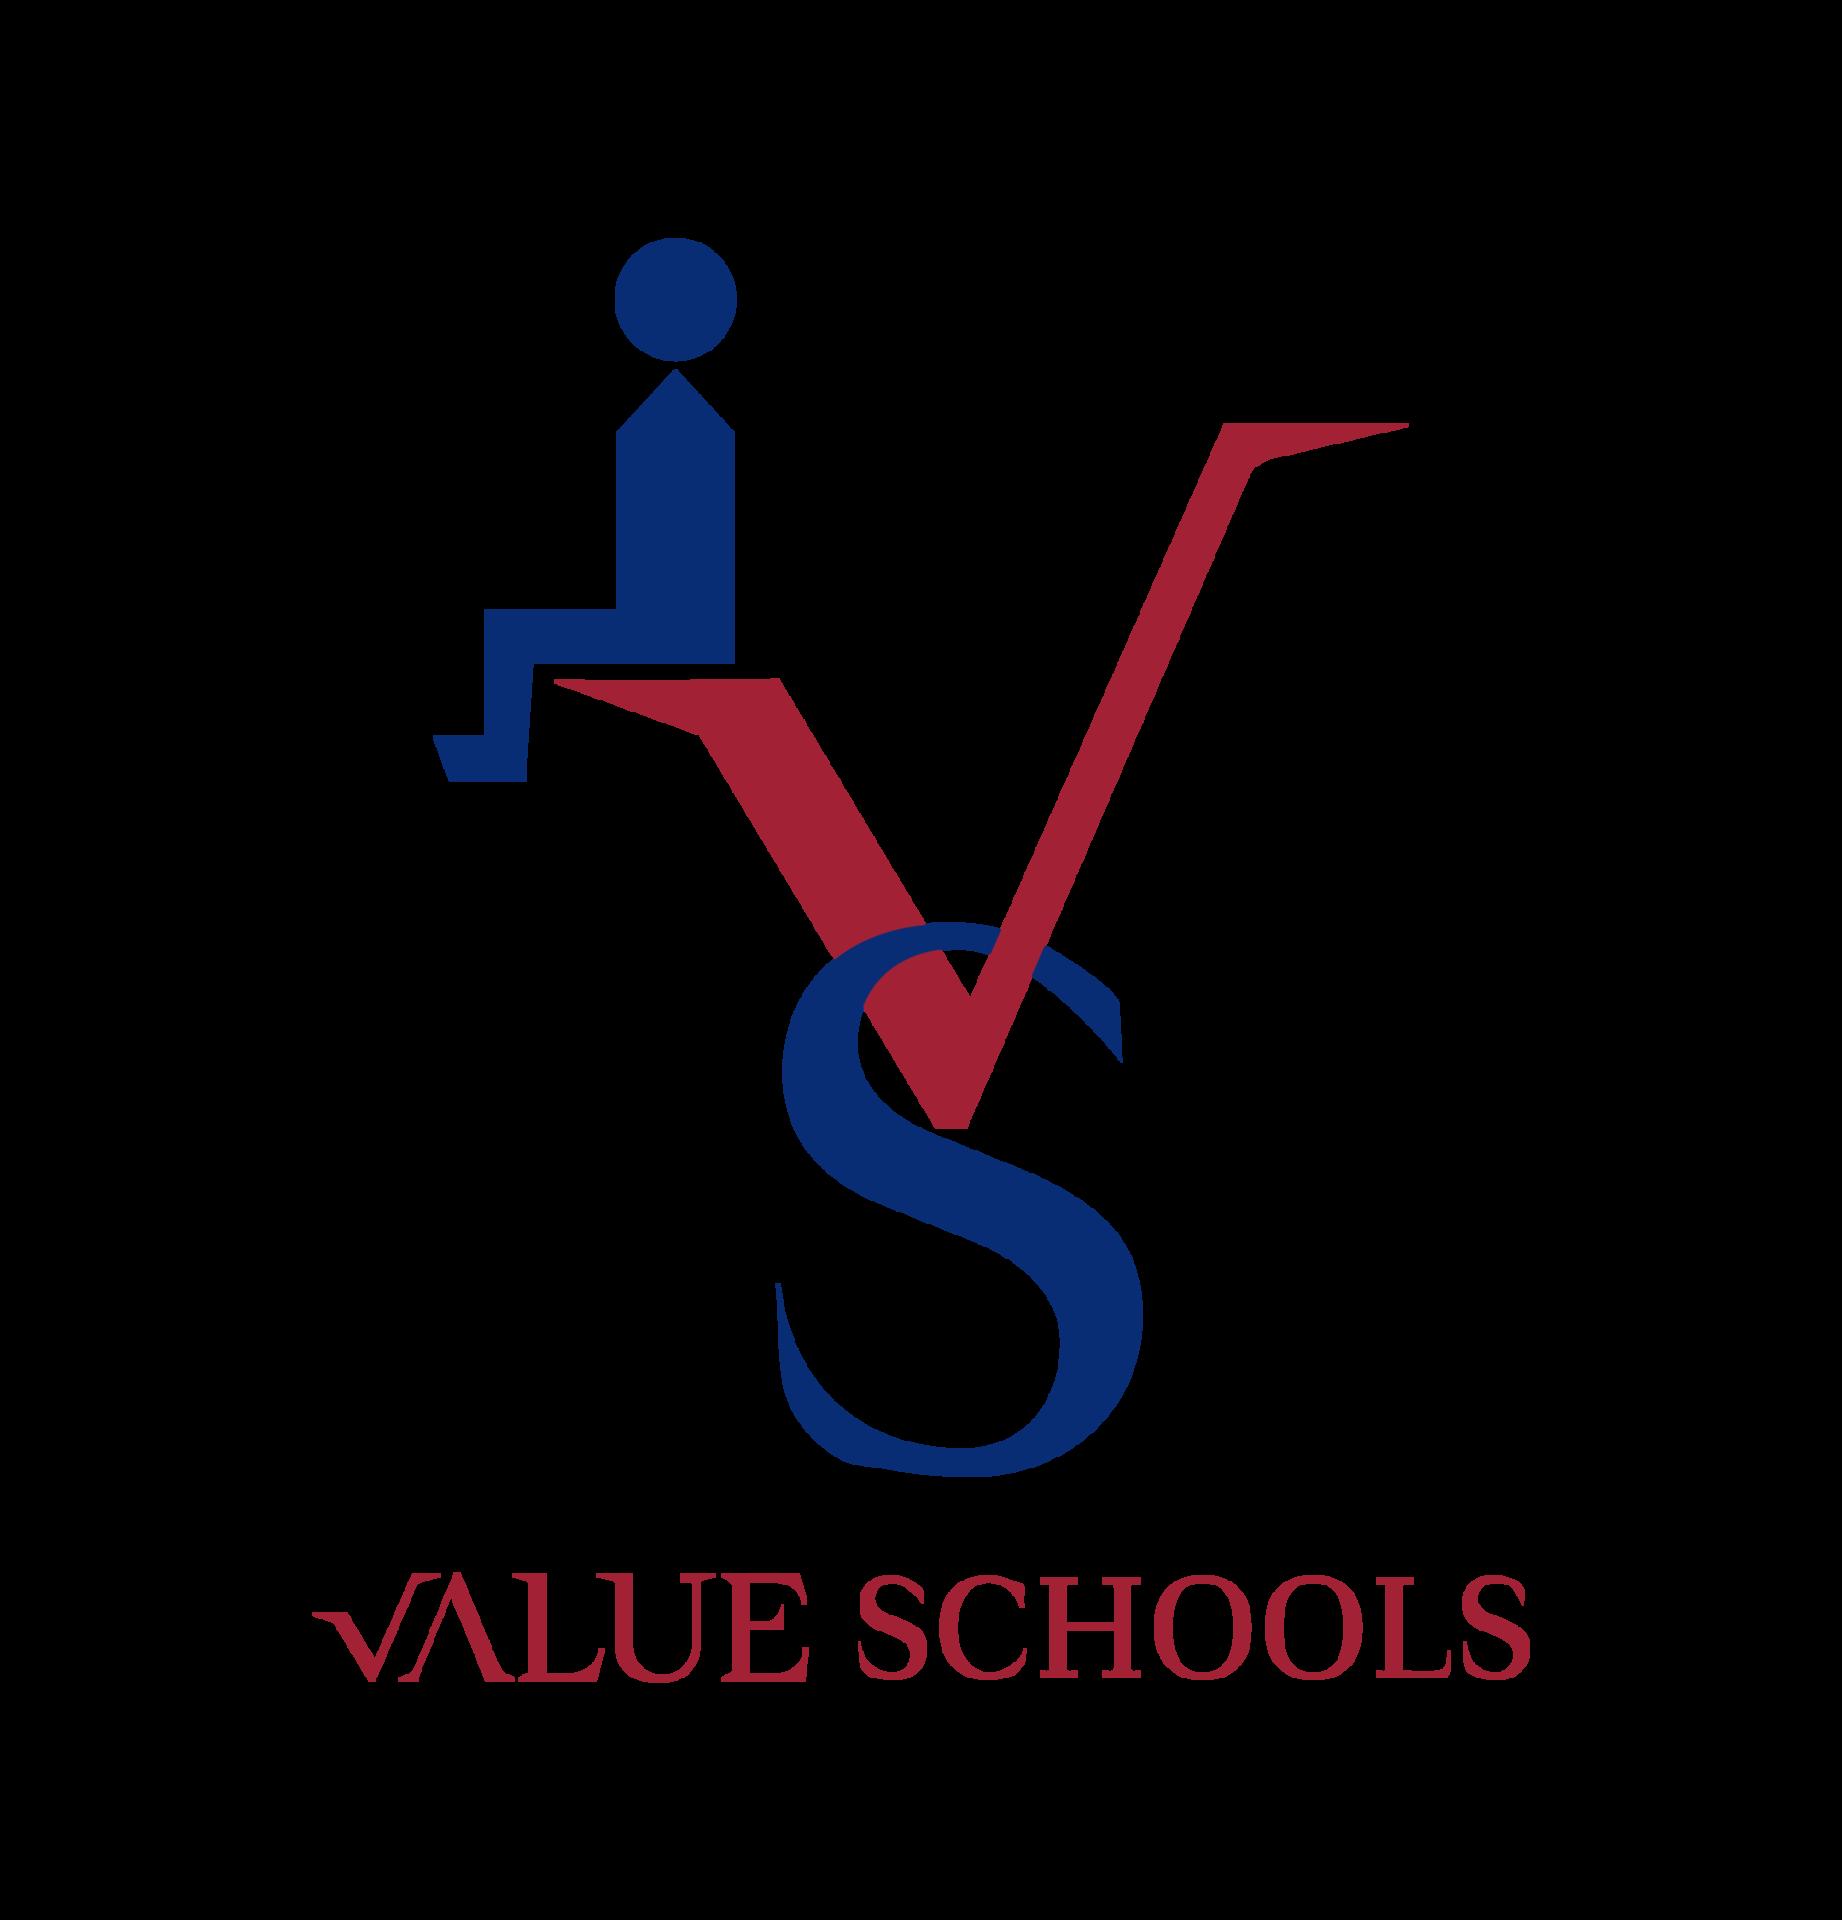 Value Schools Logo